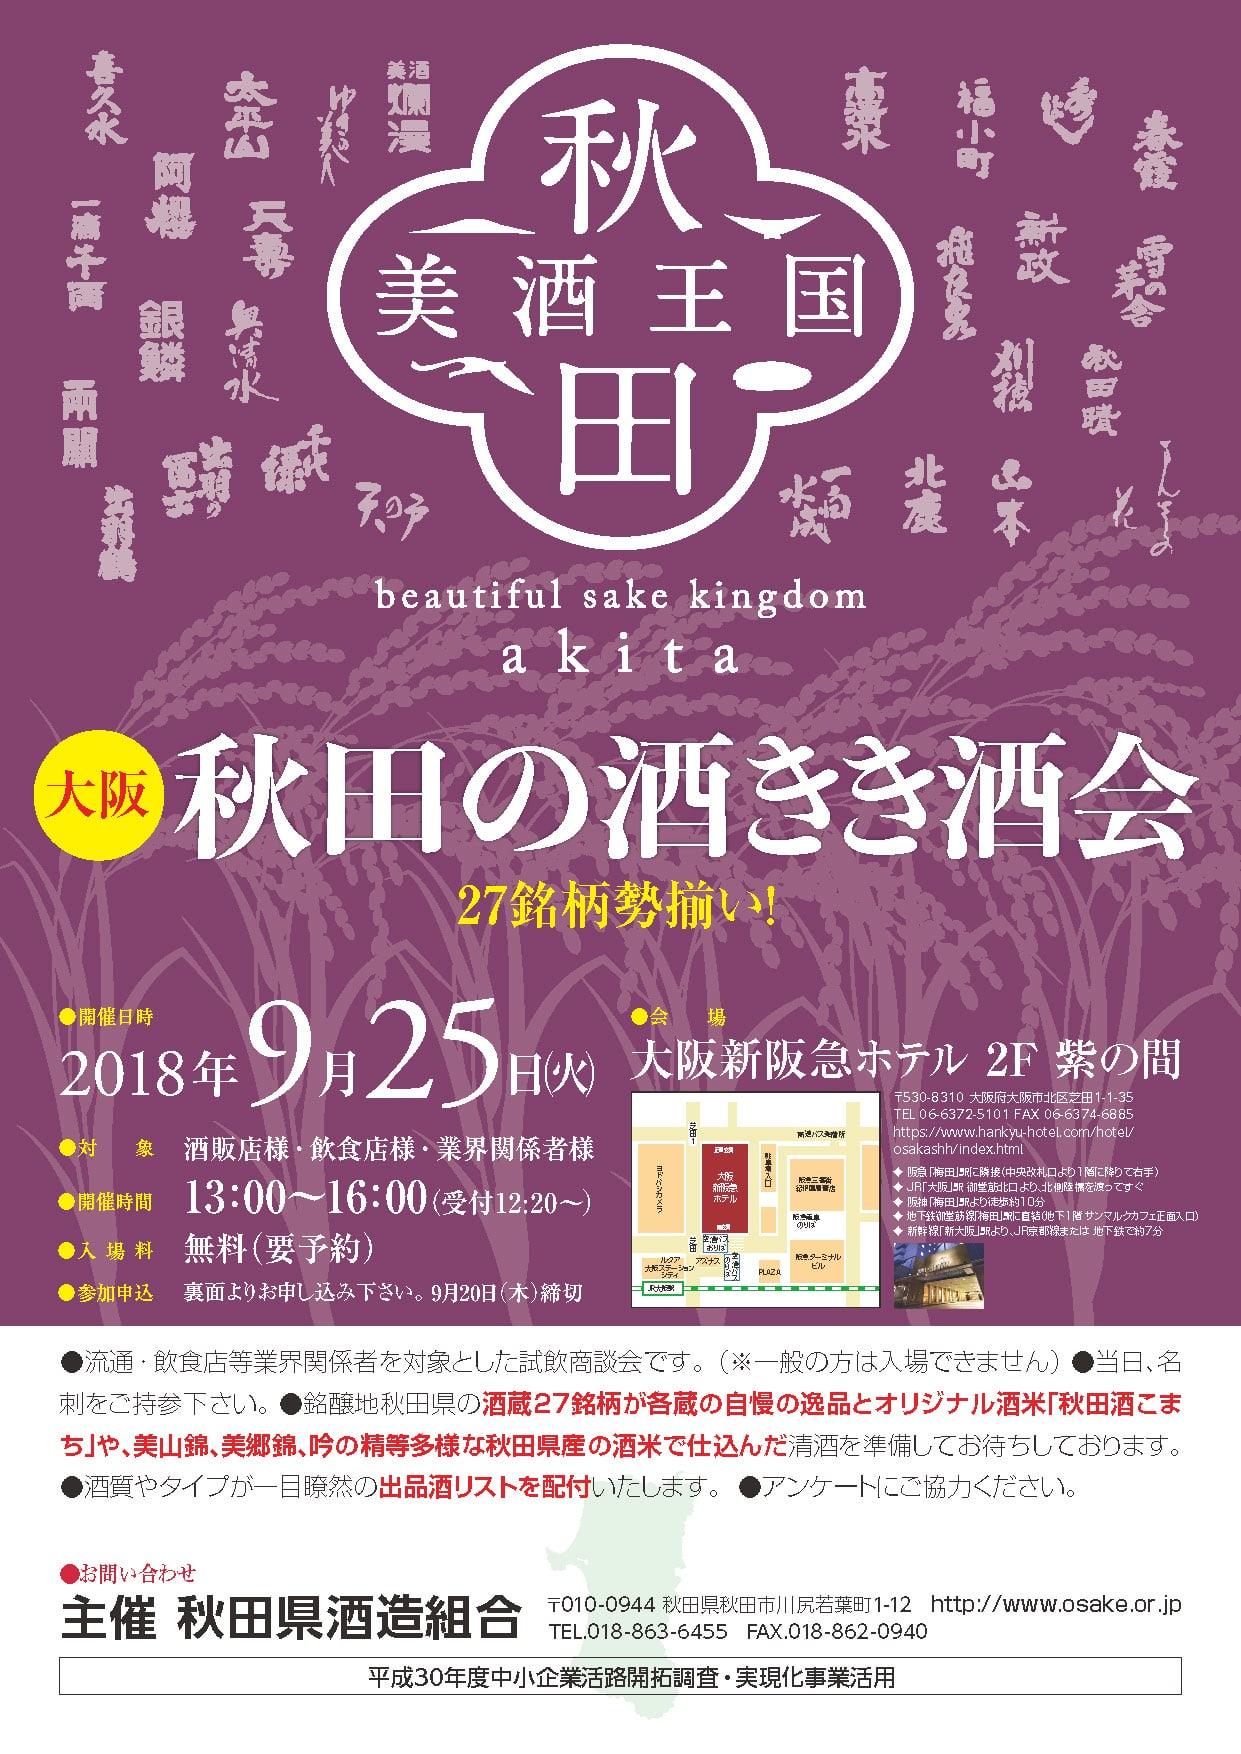 http://www.fukukomachi.com/blog/photo/osakakikizake-2018.jpg